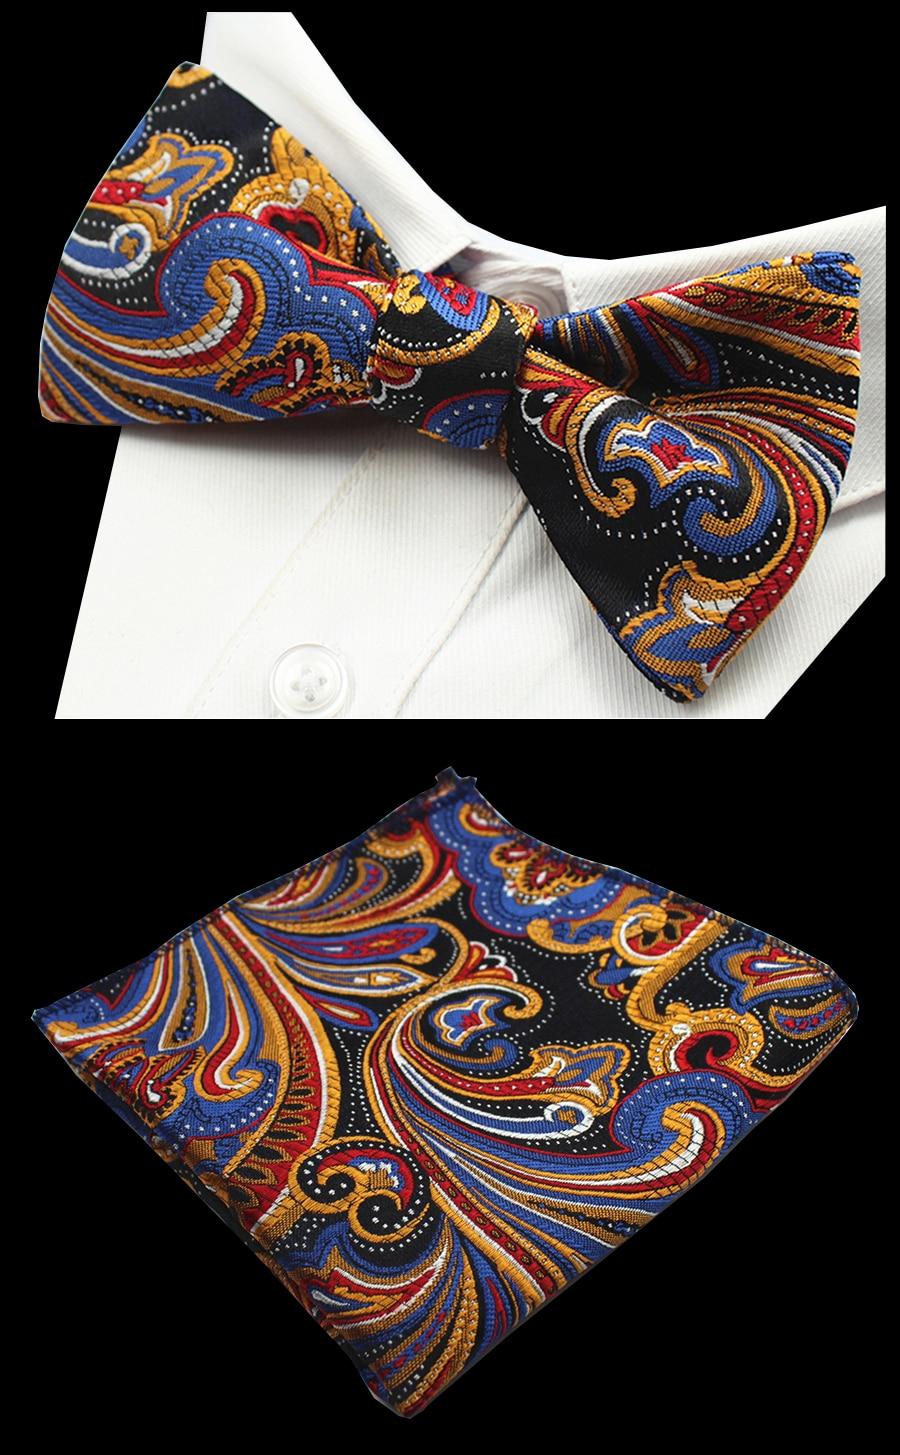 Ricnais New Quality Self Tie Bow Tie And Hanky Set Silk Jacquard Woven Men BowTie Pocket Square Handkerchief Suit Wedding